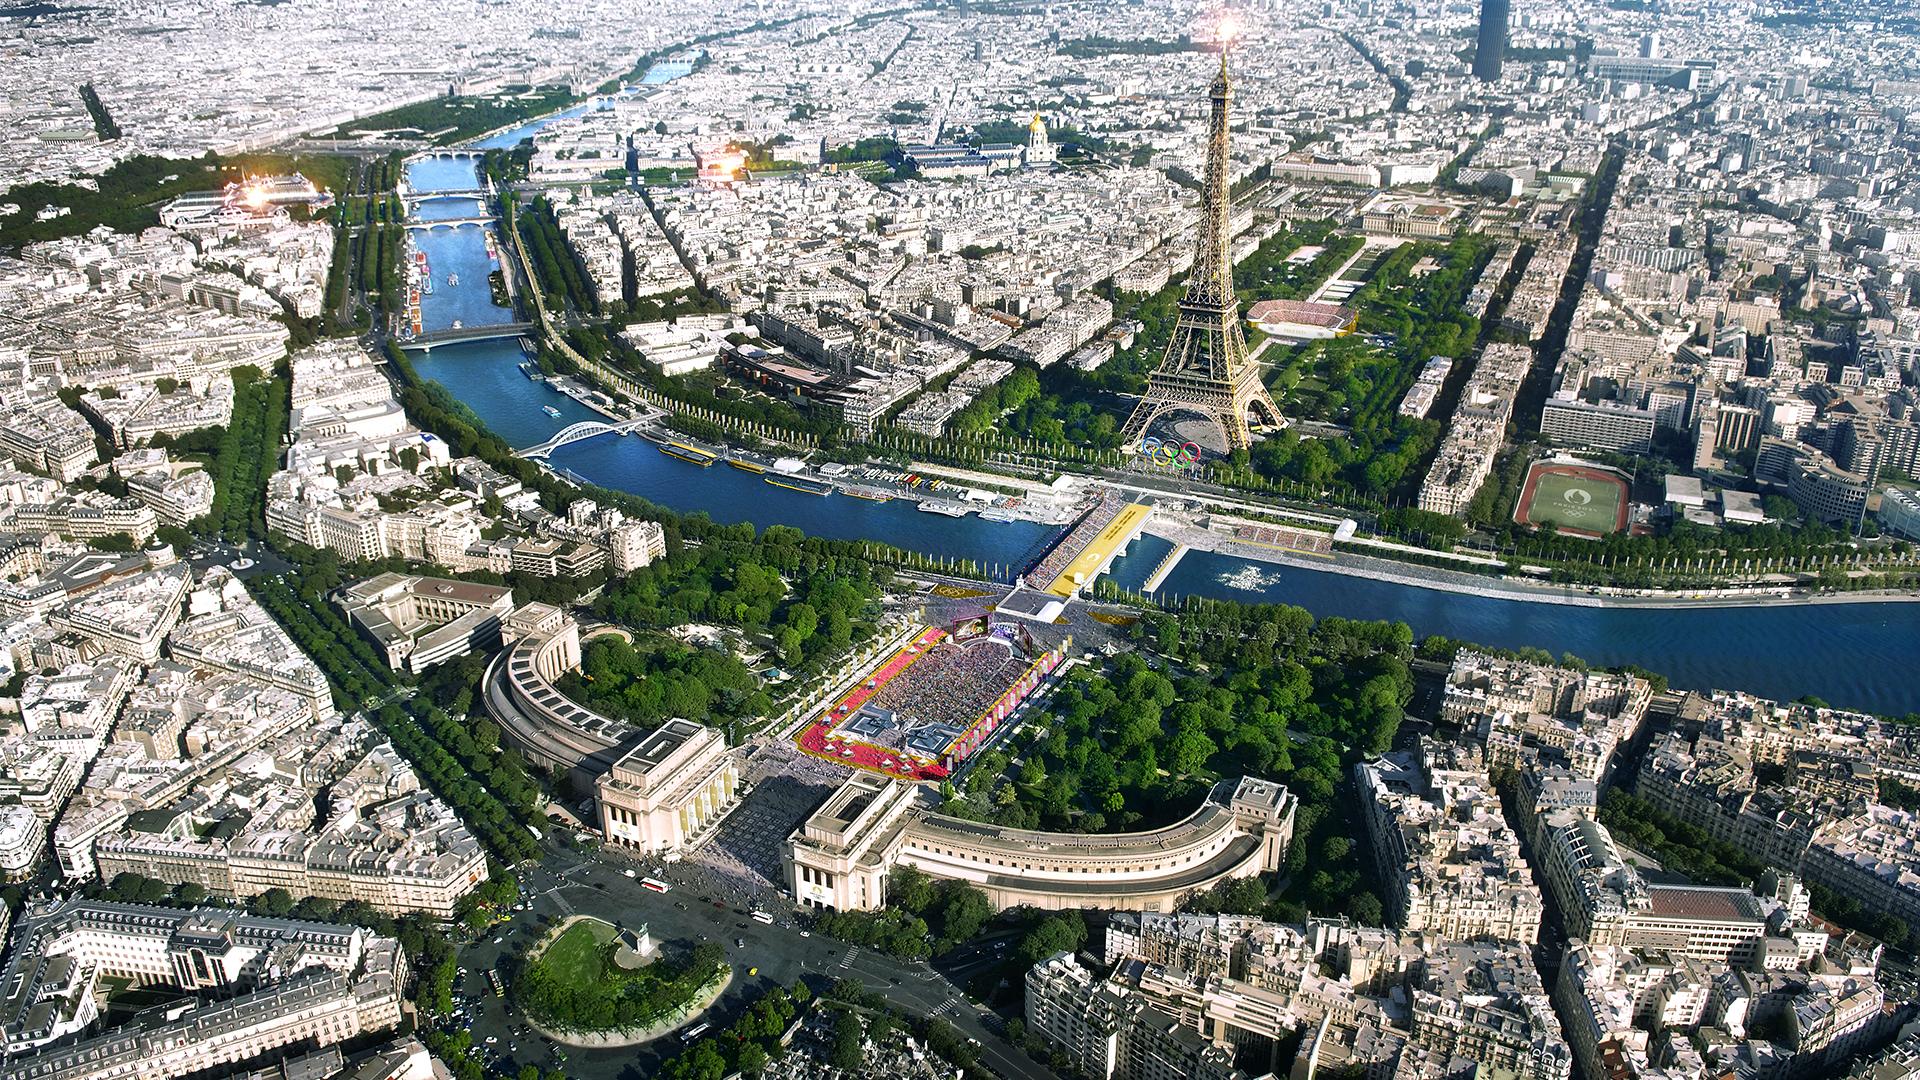 Credits: Paris 2024.org